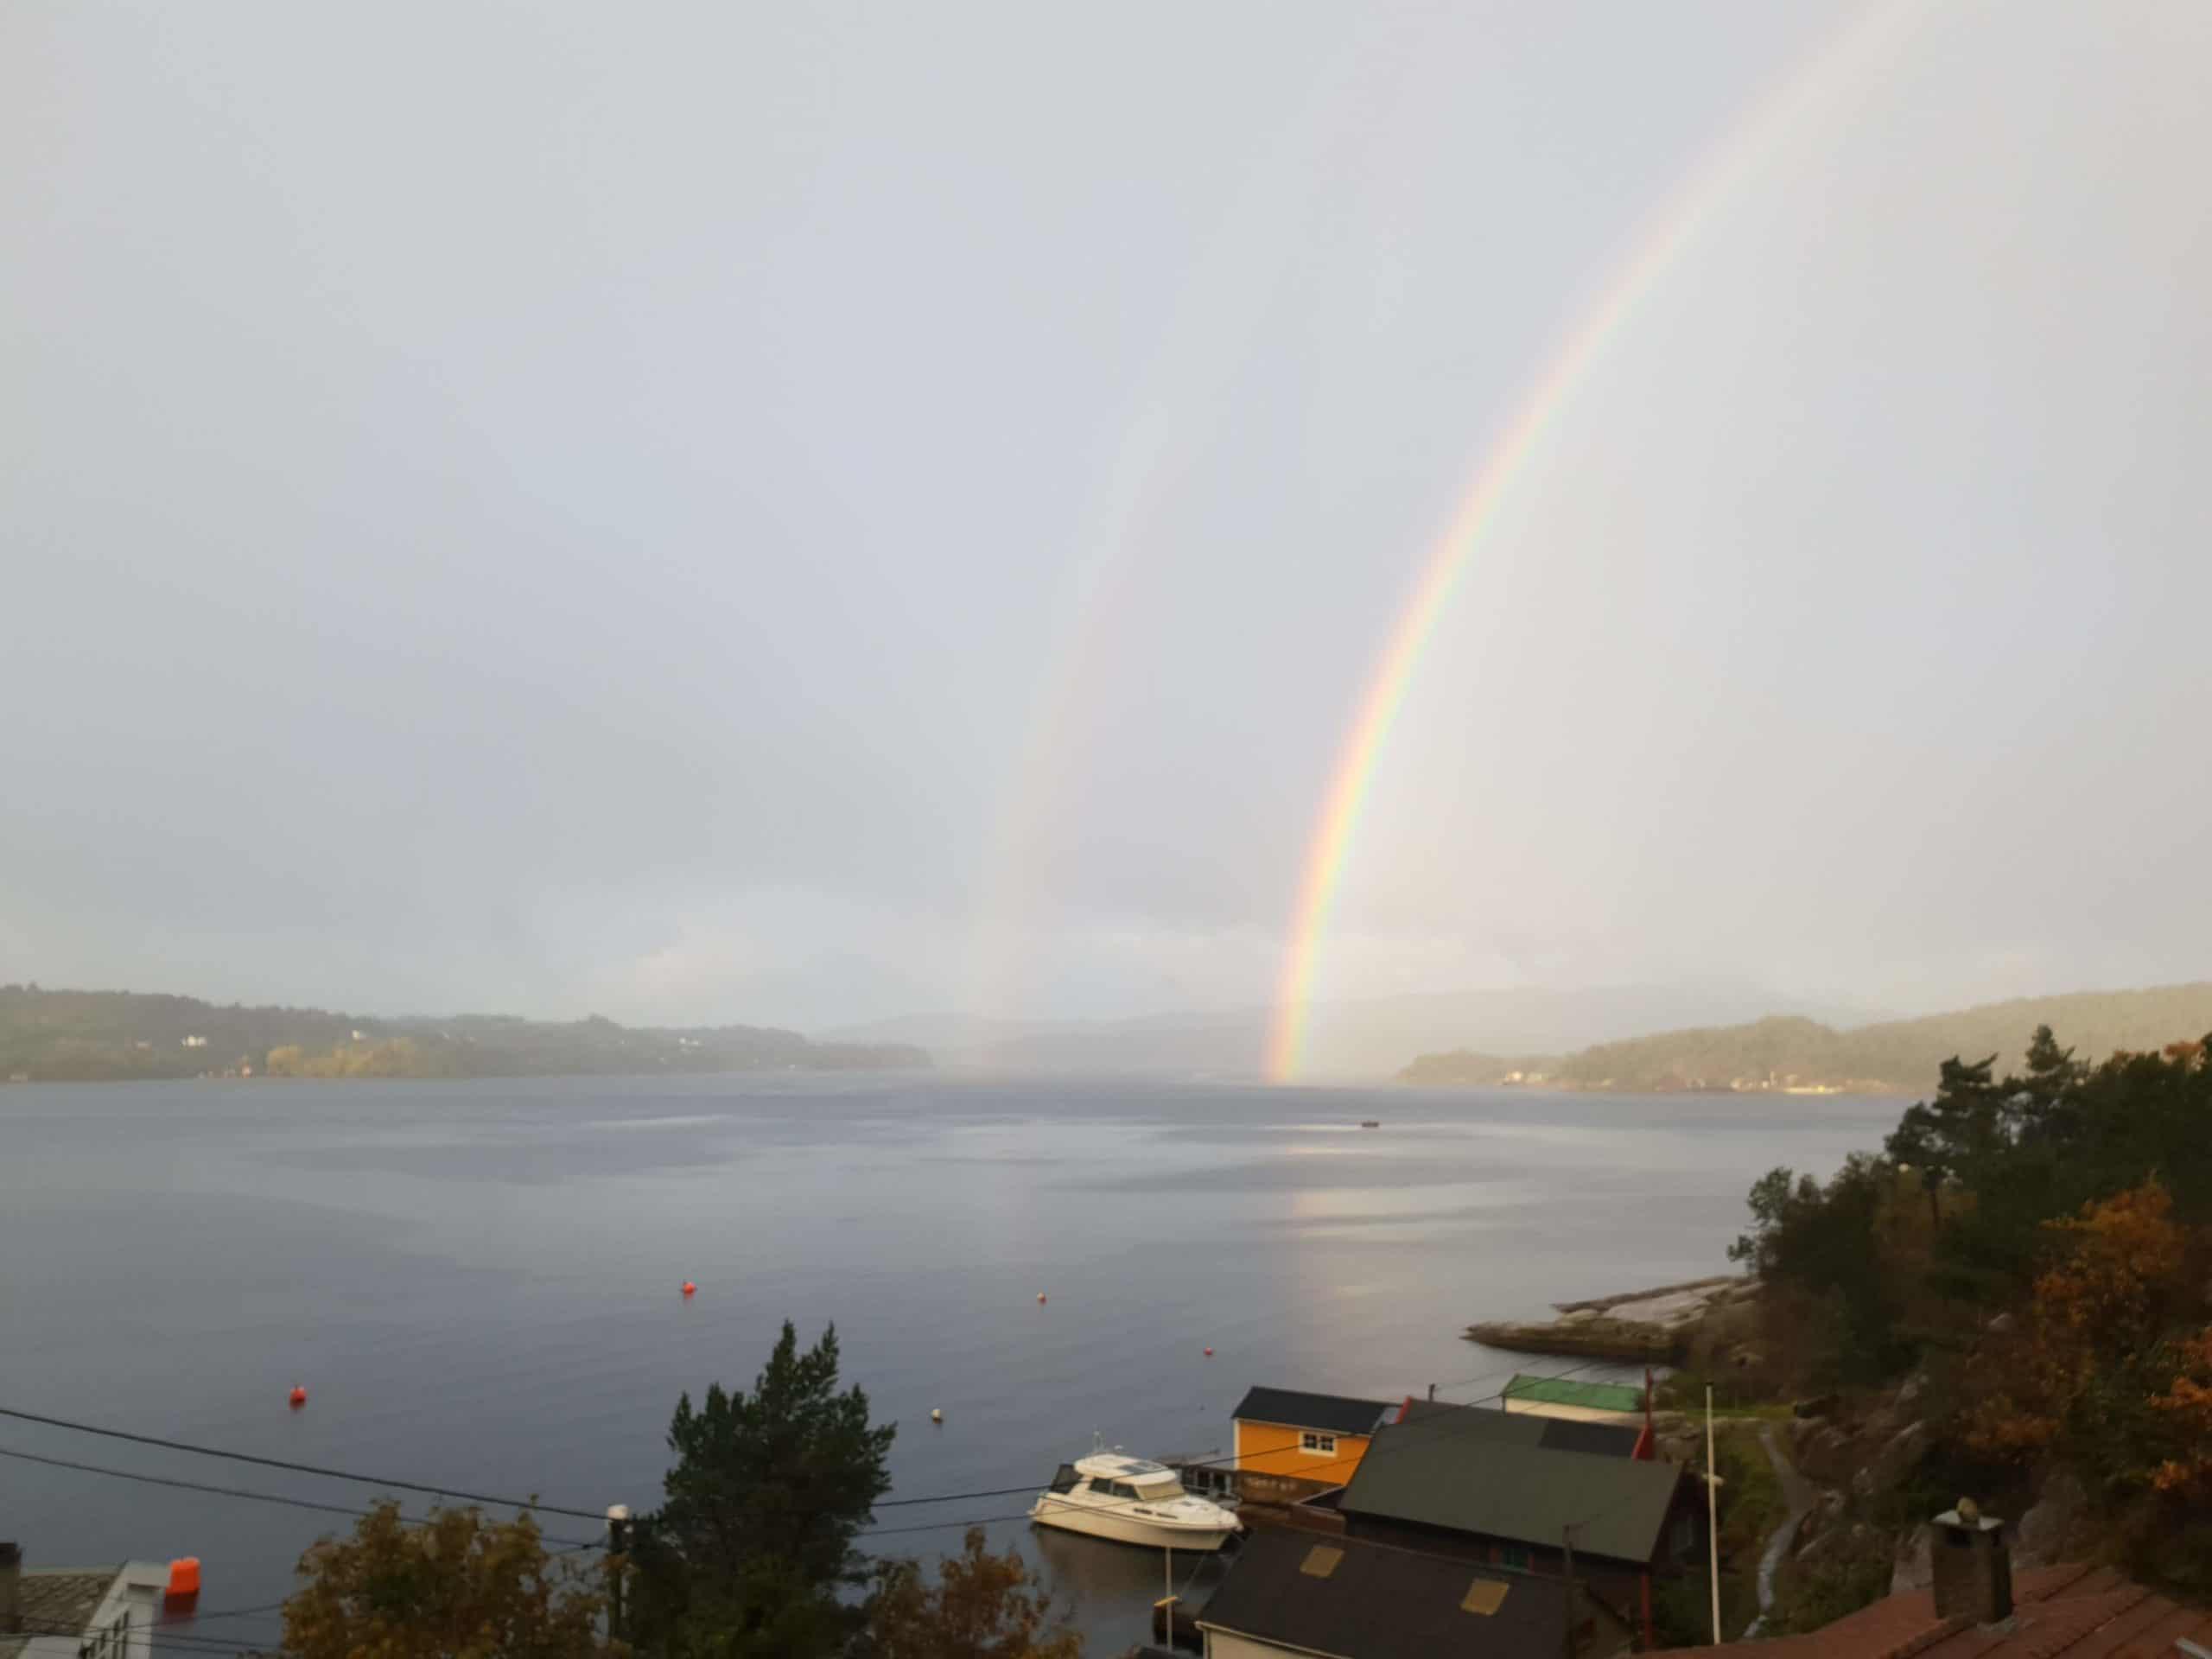 More magical views